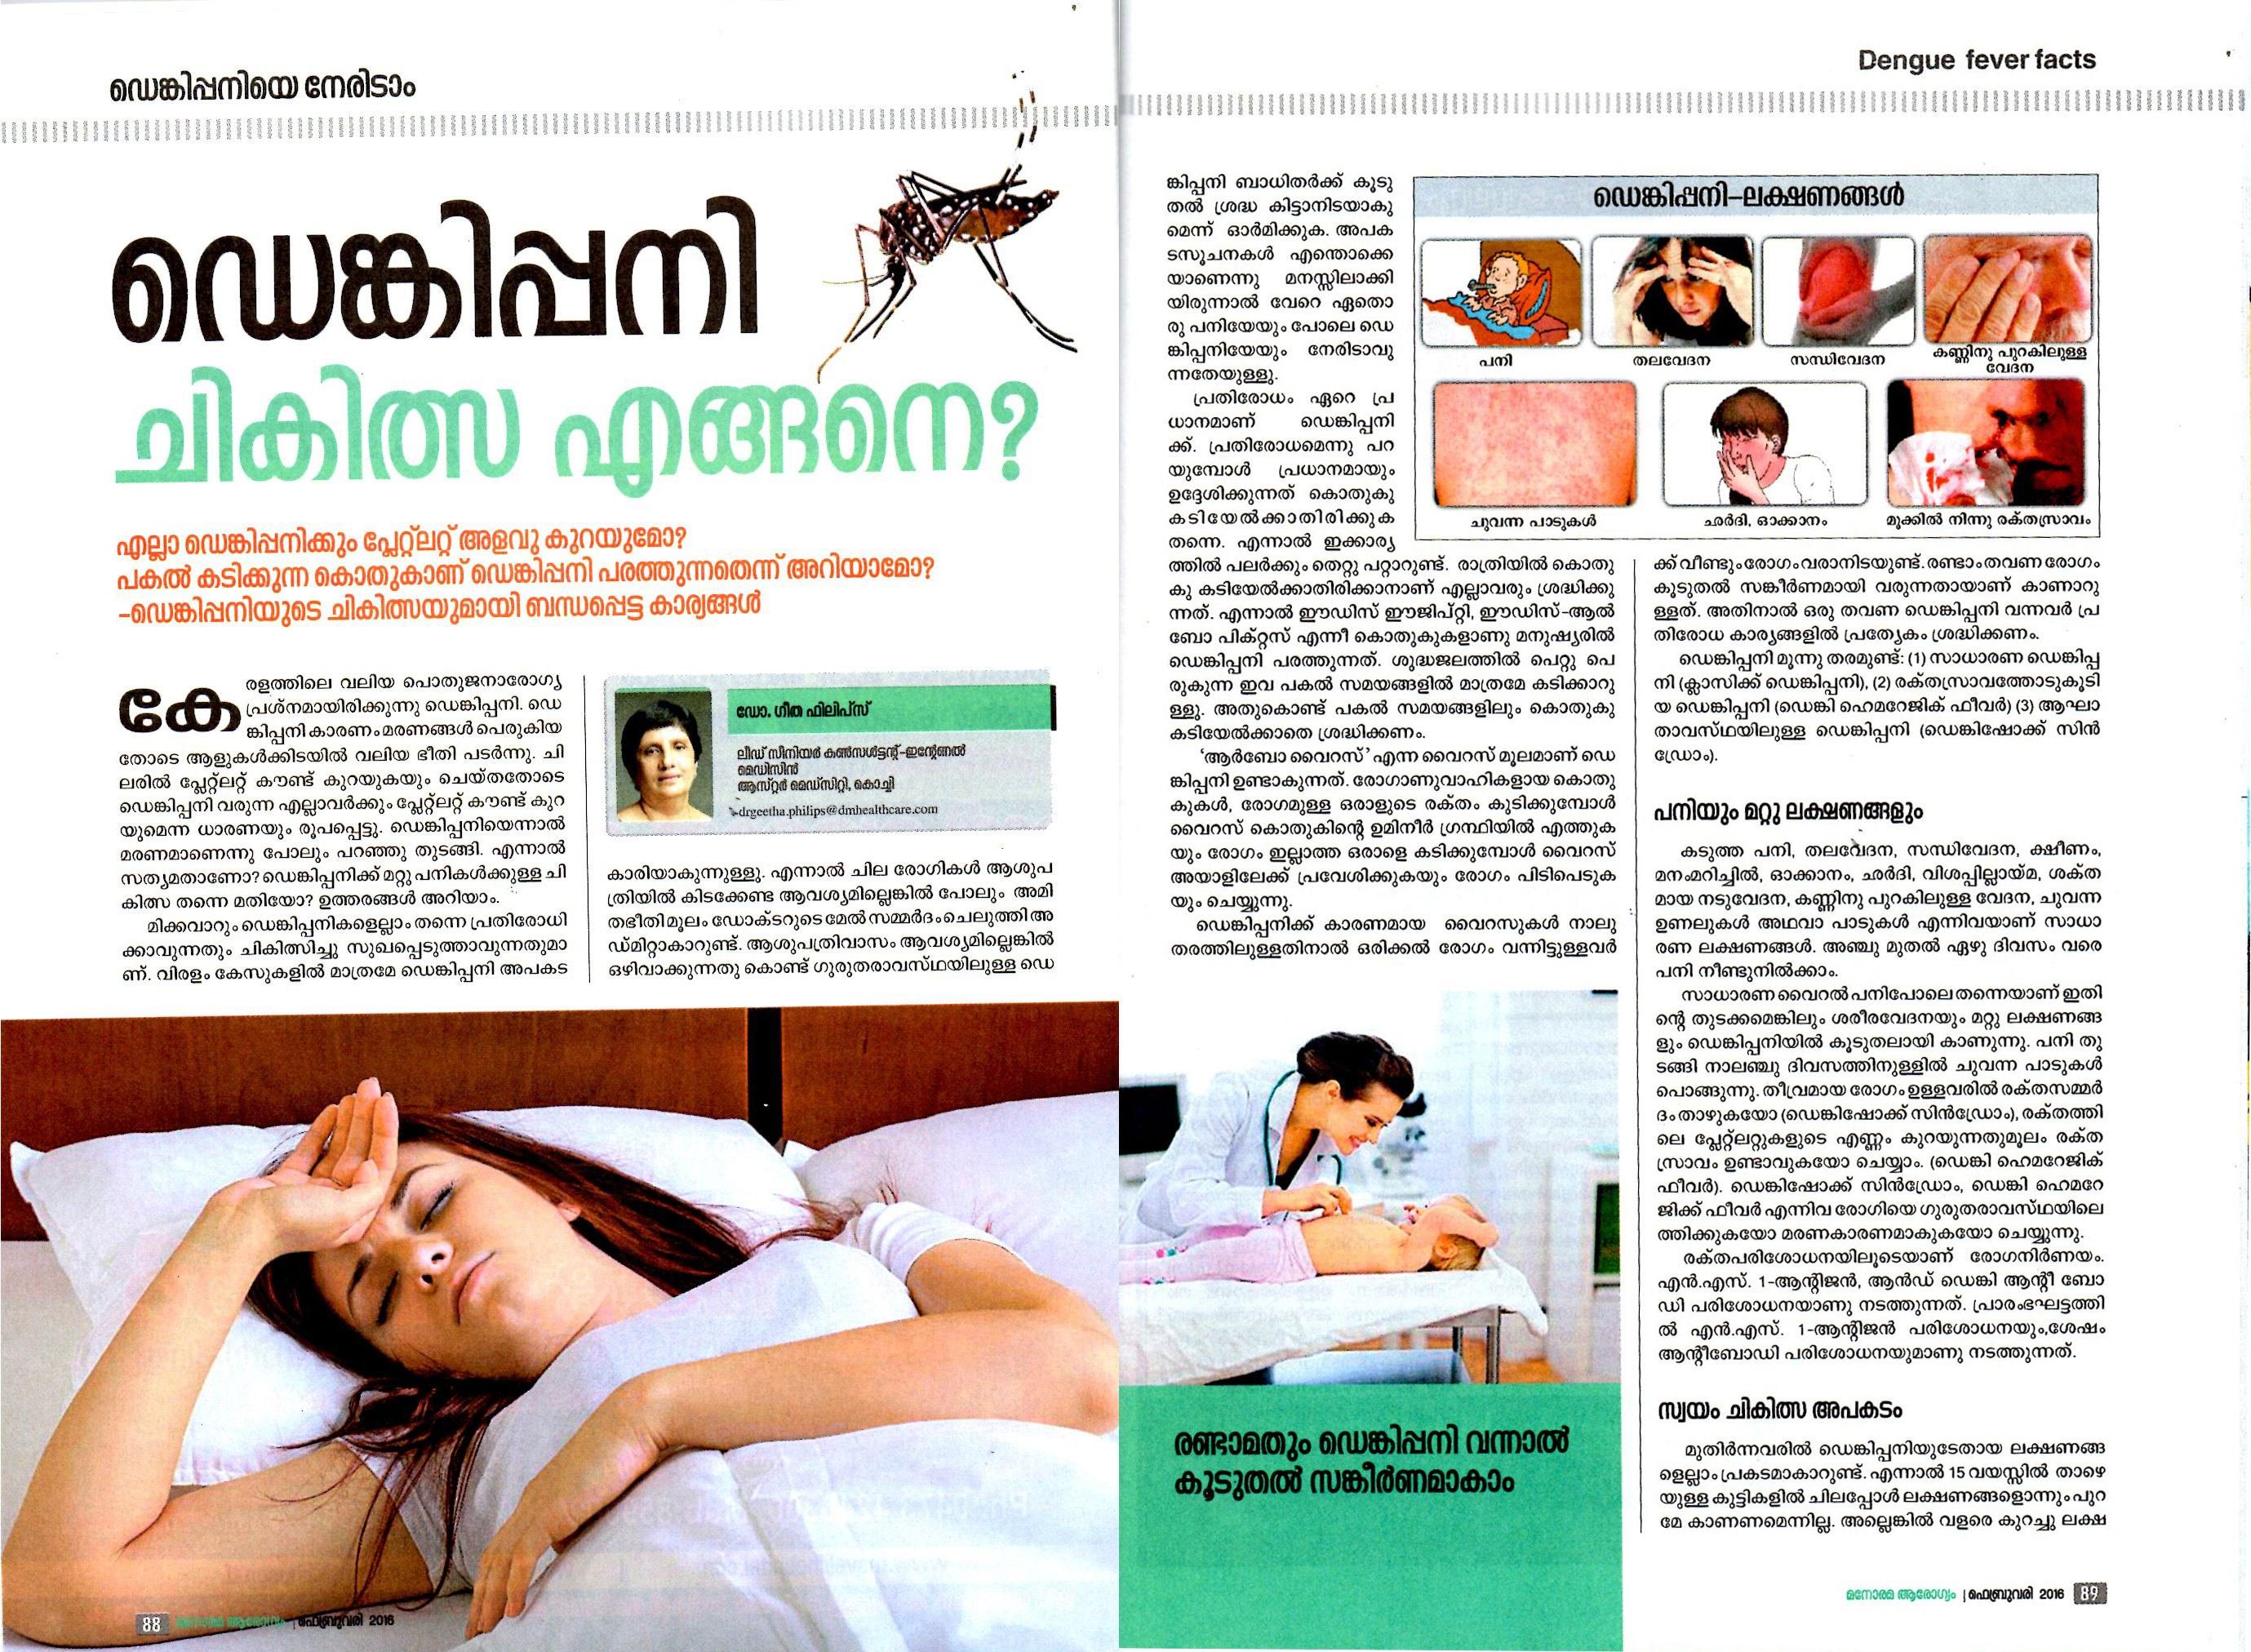 Dr.-Geetha-Philip-Manorama-Arogyam-Magazine